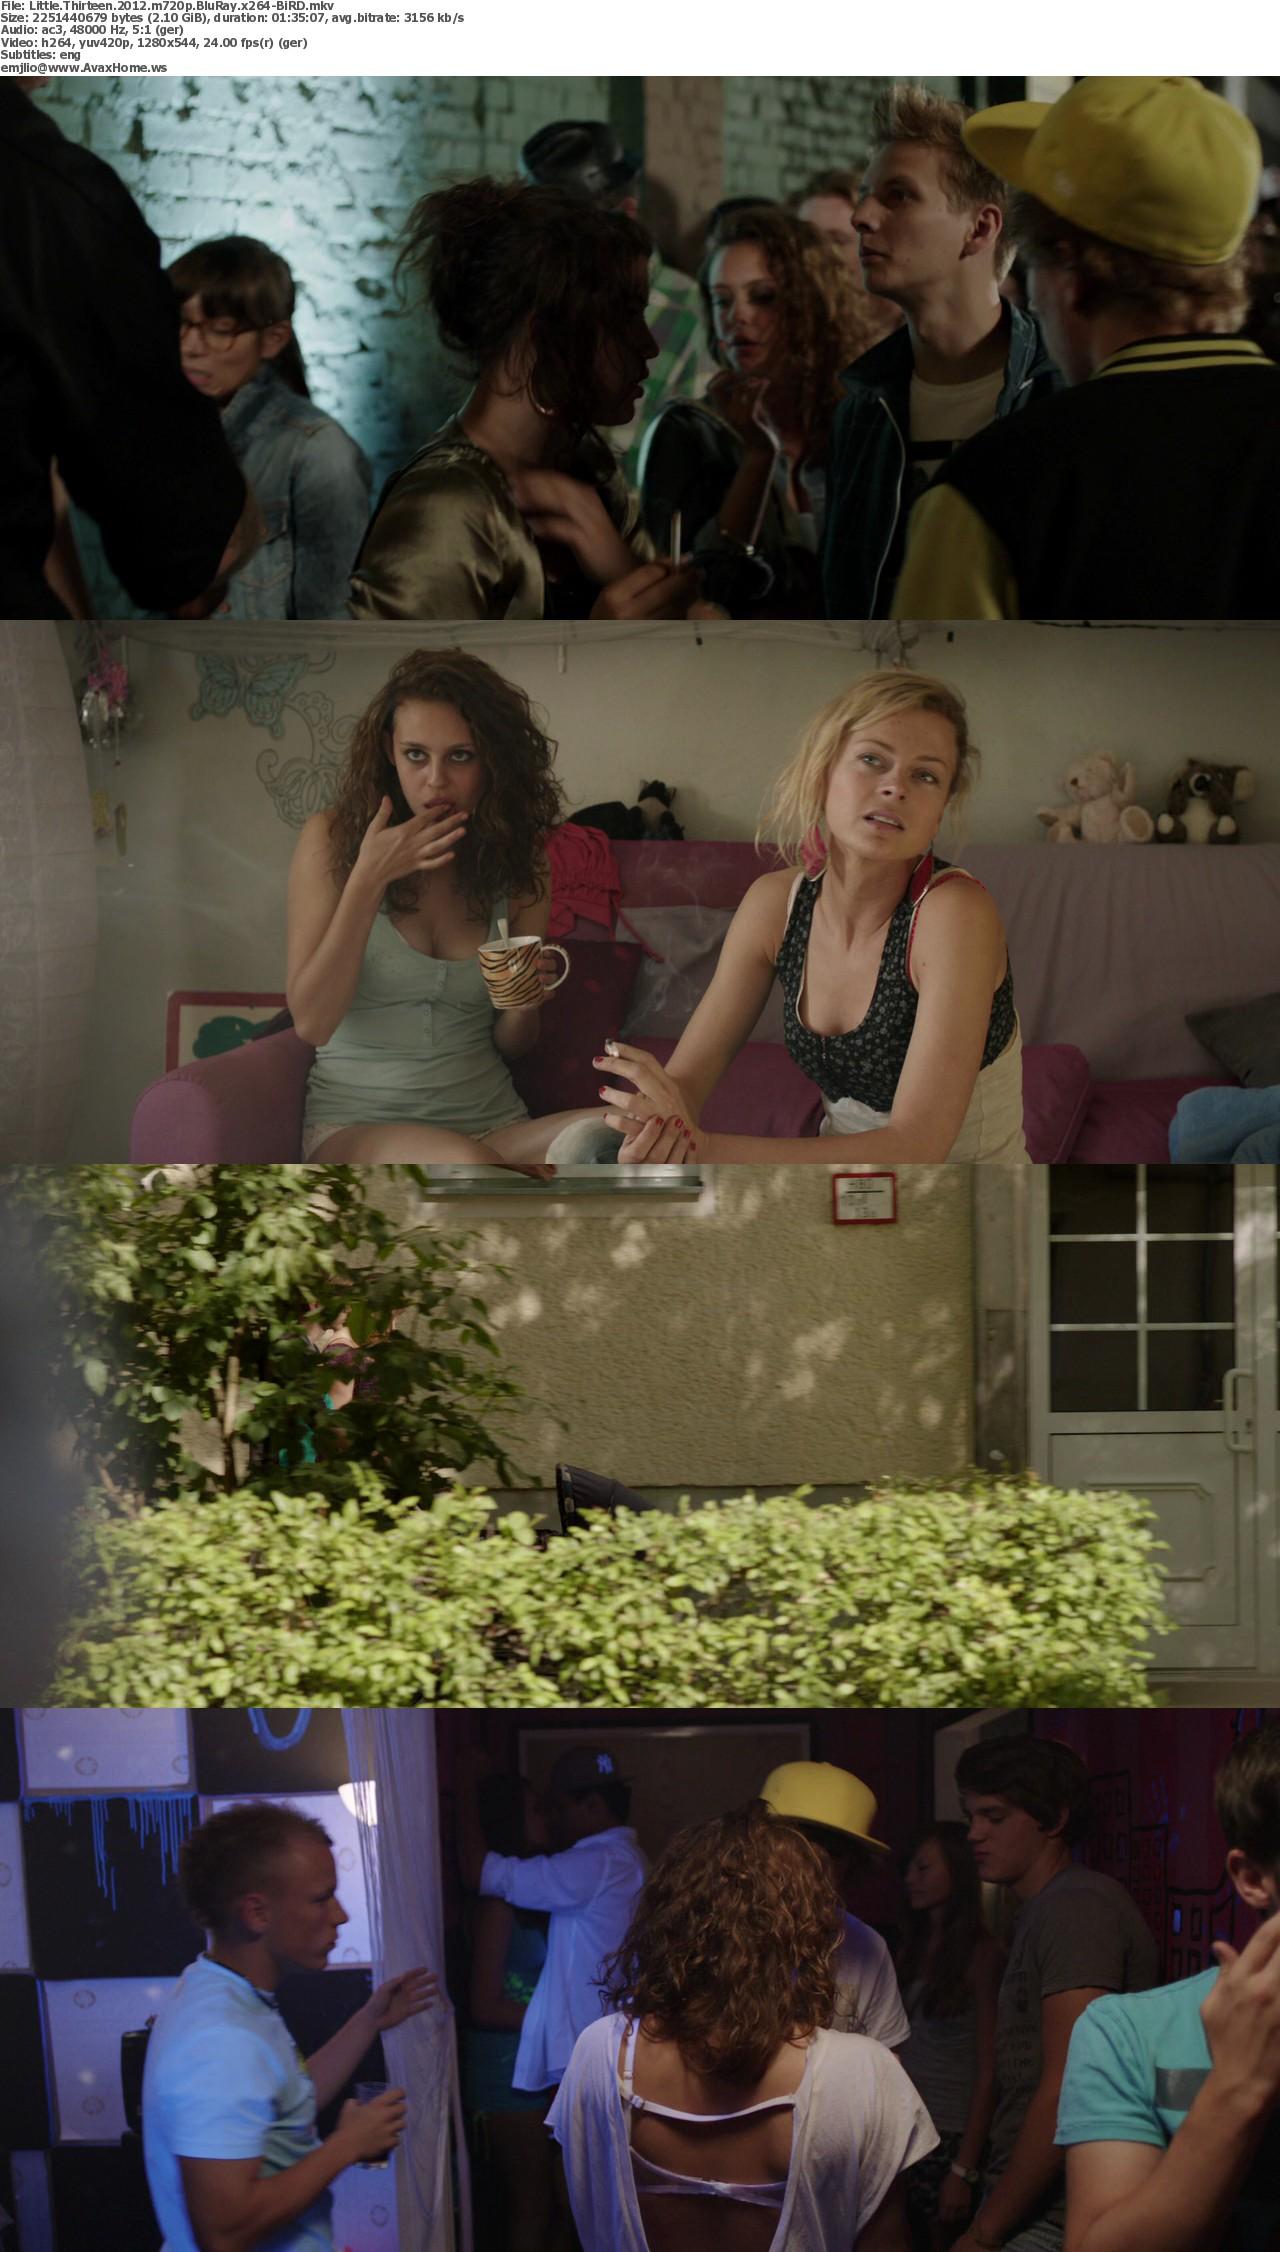 Little Thirteen 2012 - Boyhood movies download